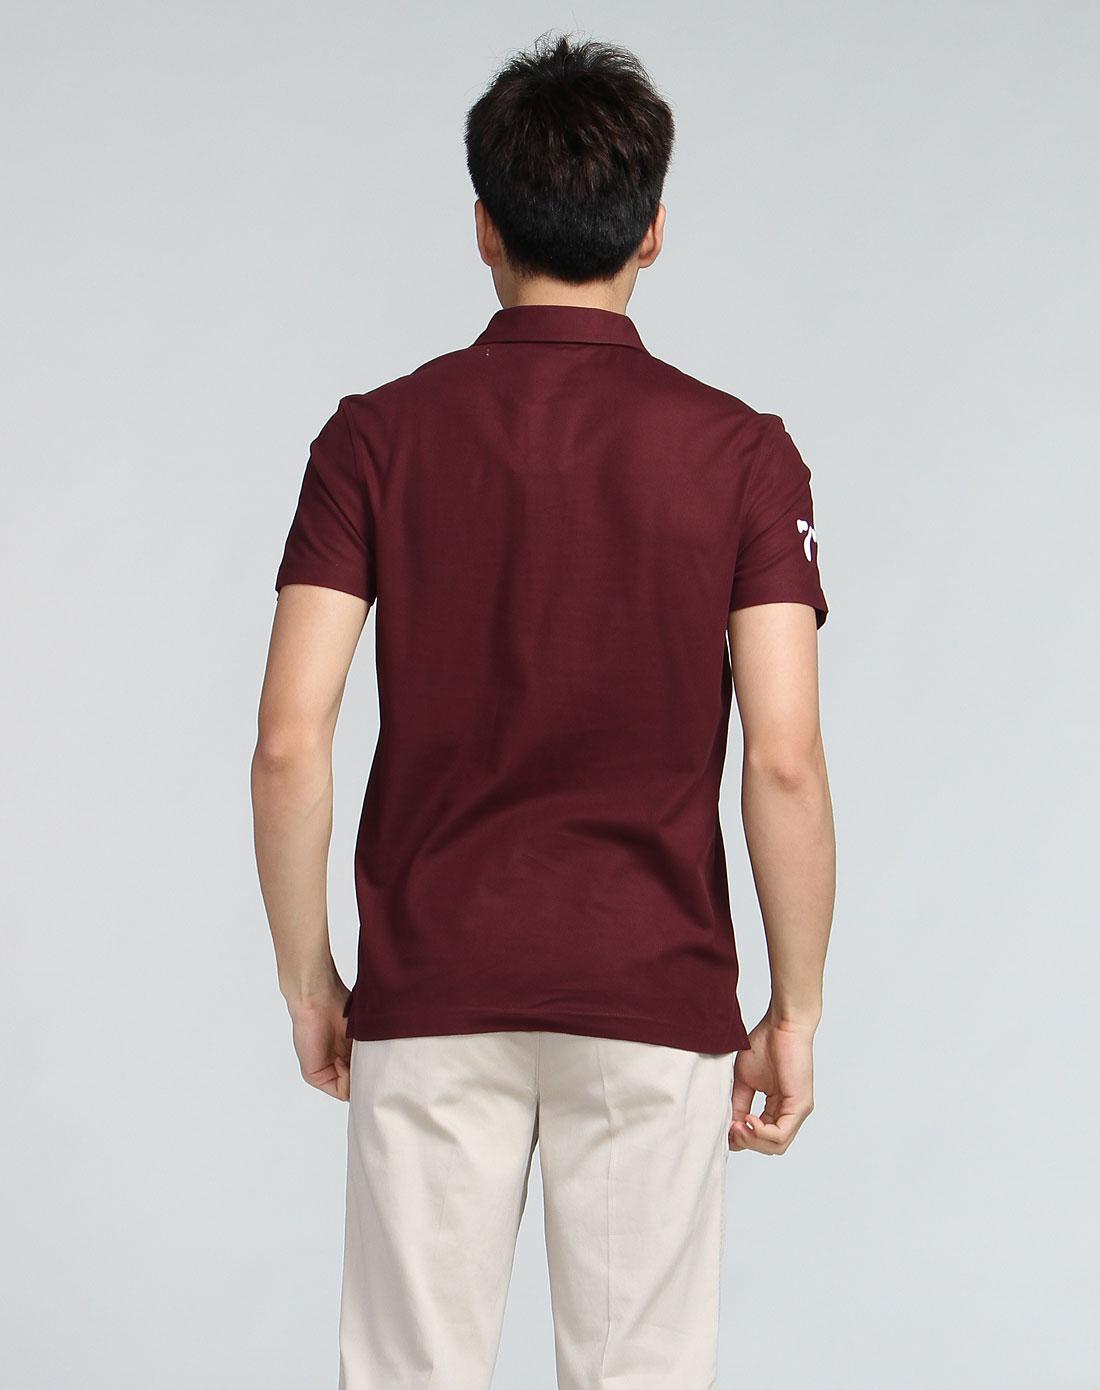 领�9k�iY�[��y�N���_植绒印花polo领短袖酒红色t恤